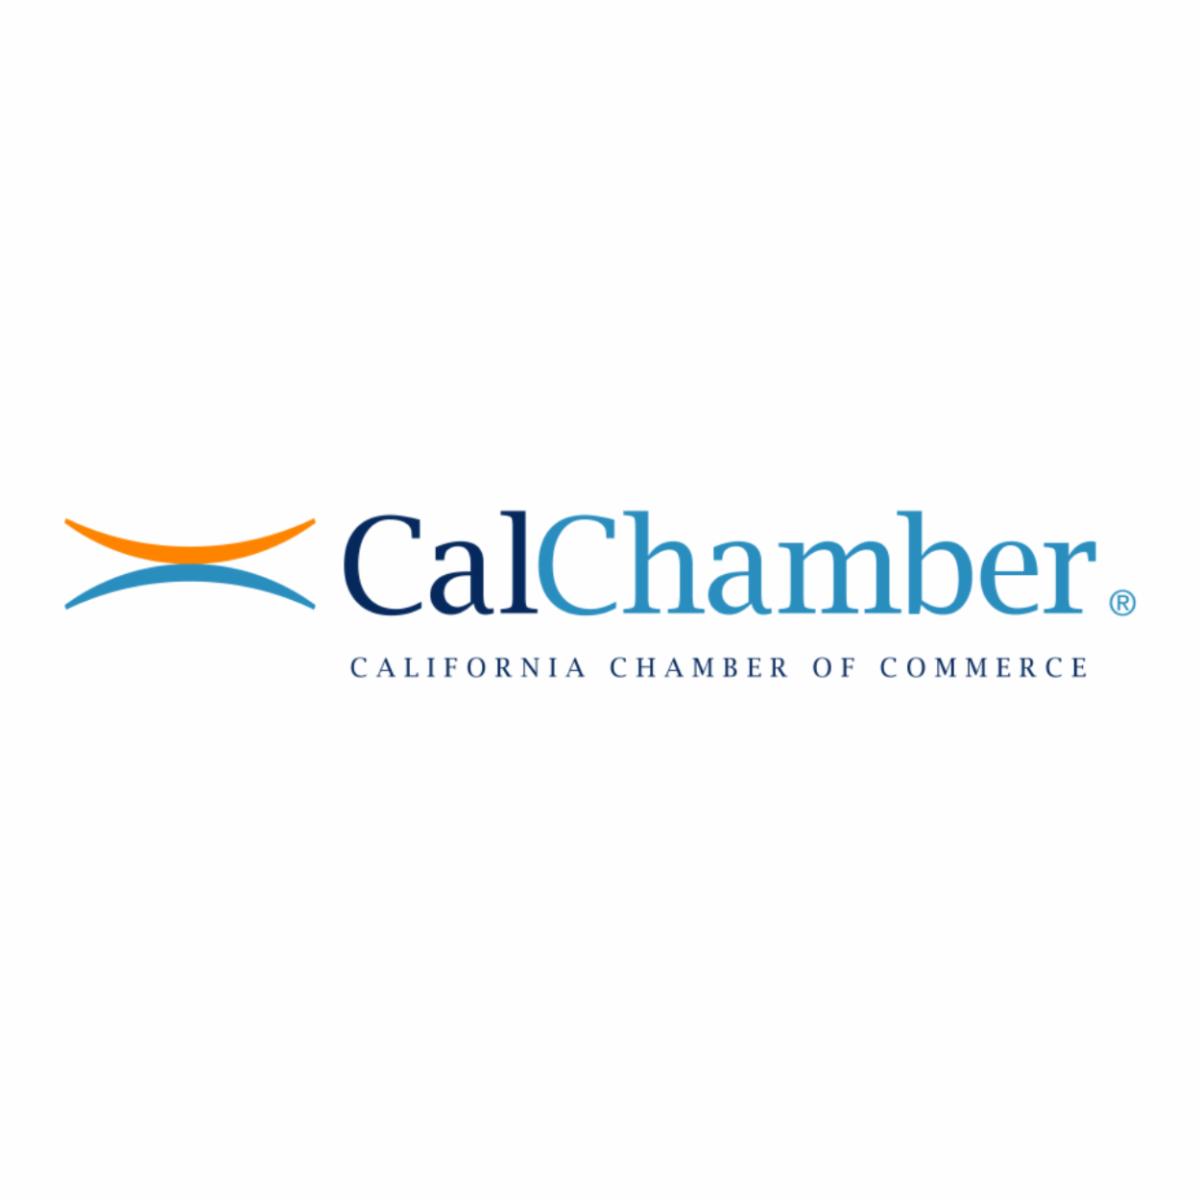 calchamber_logo.png